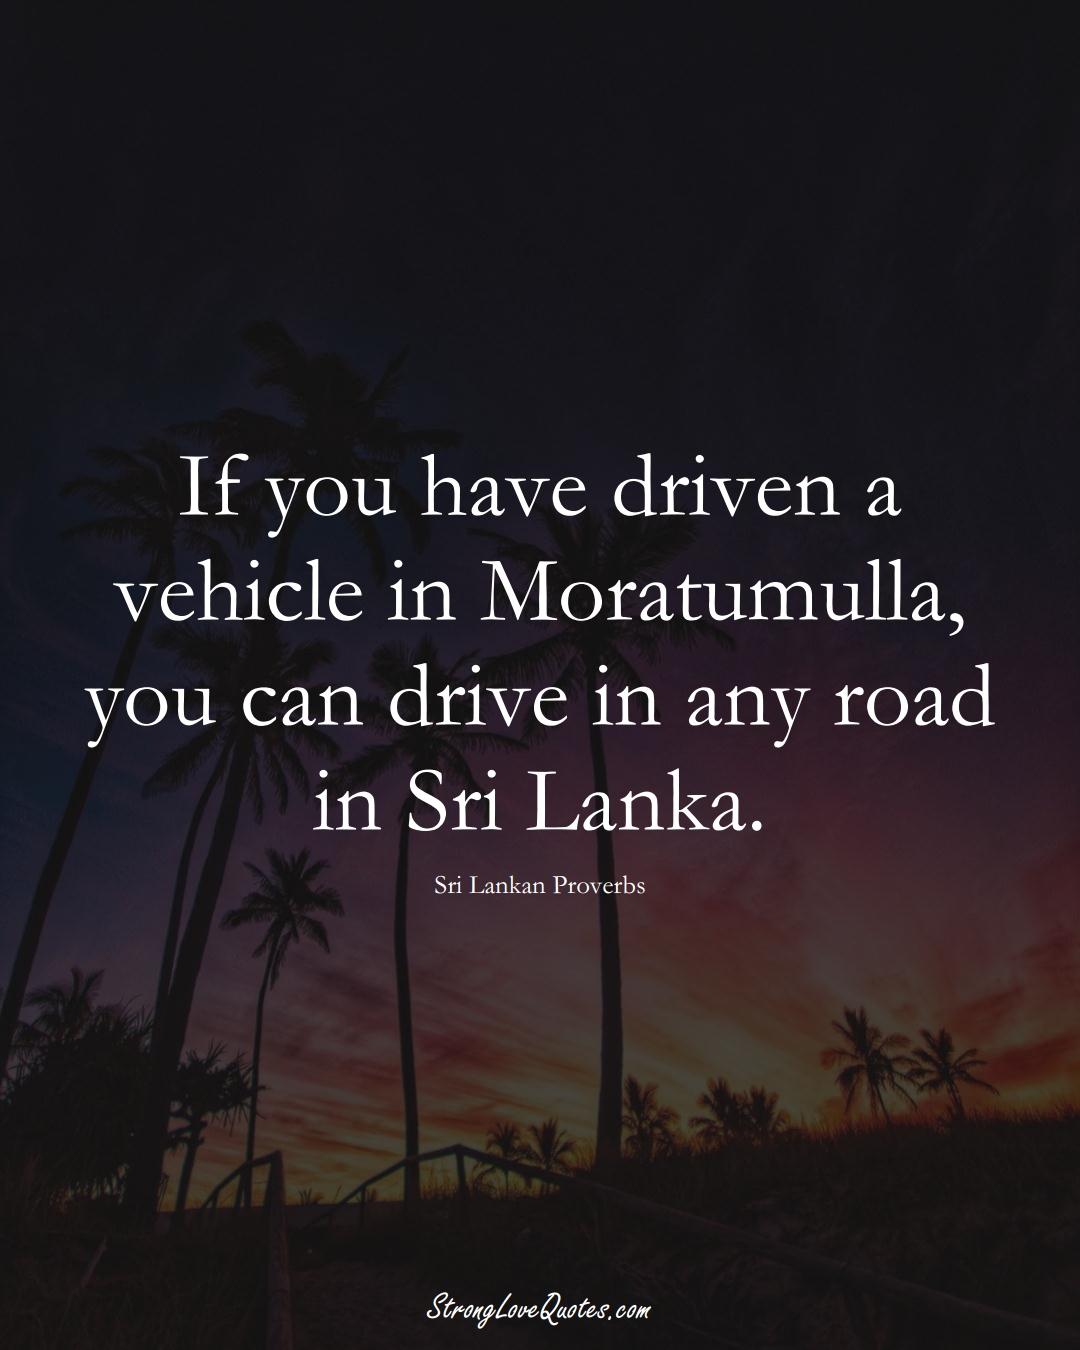 If you have driven a vehicle in Moratumulla, you can drive in any road in Sri Lanka. (Sri Lankan Sayings);  #AsianSayings